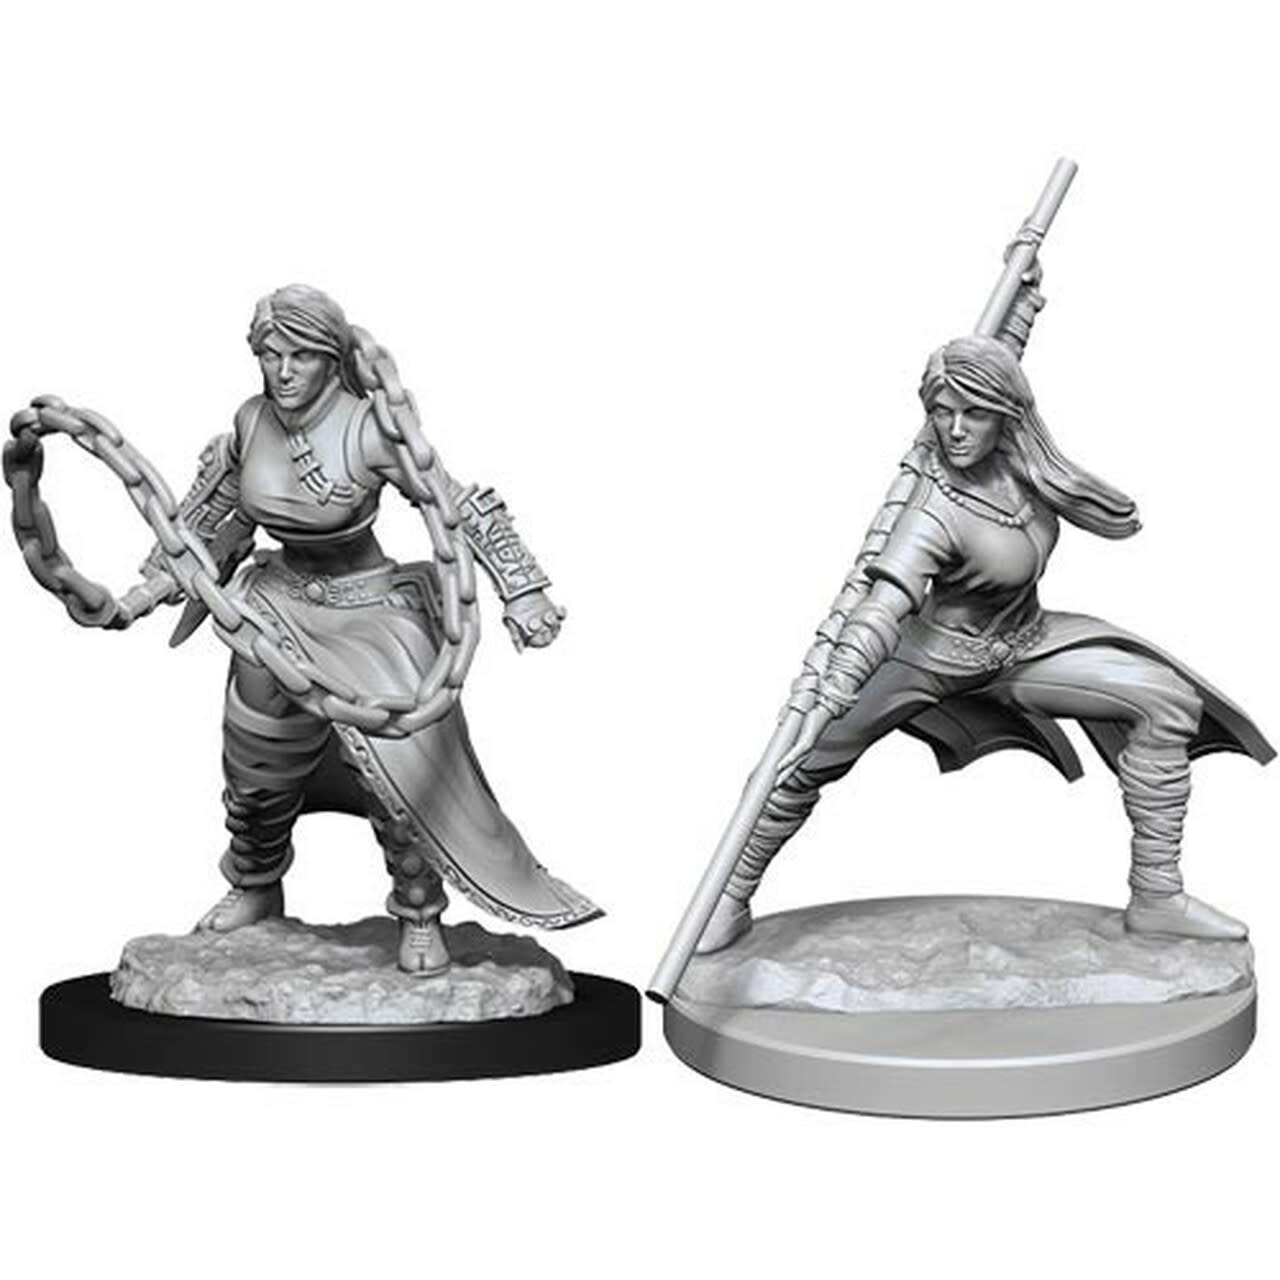 Wizkids D&D Nolzurs Miniatures: Human Monk Female